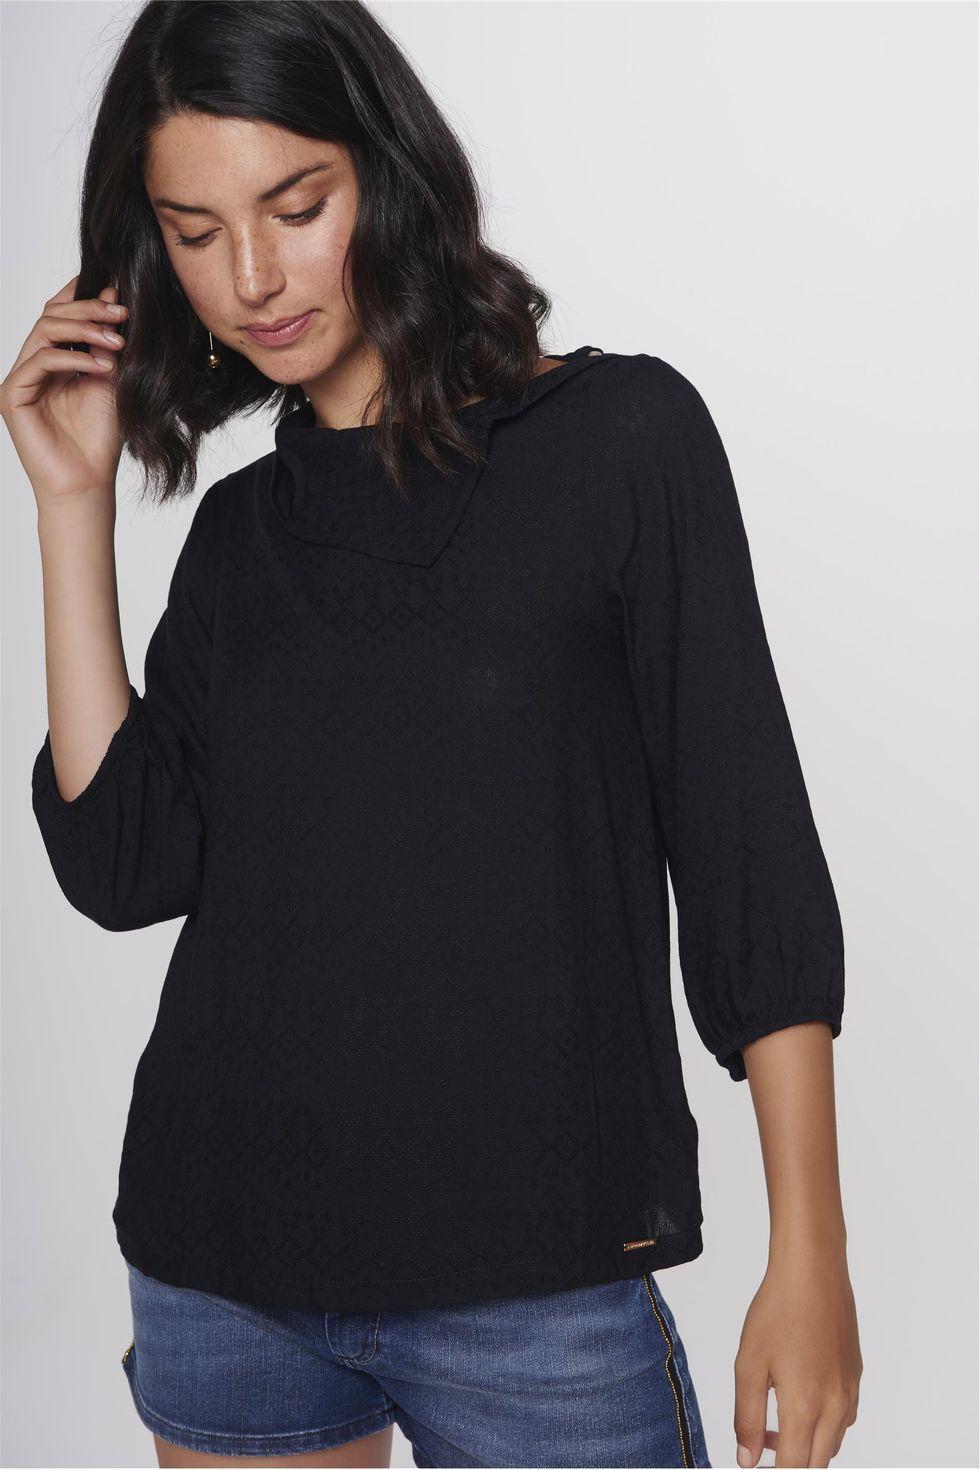 Blusa-Detalhe-ombro-Feminina-Frente--